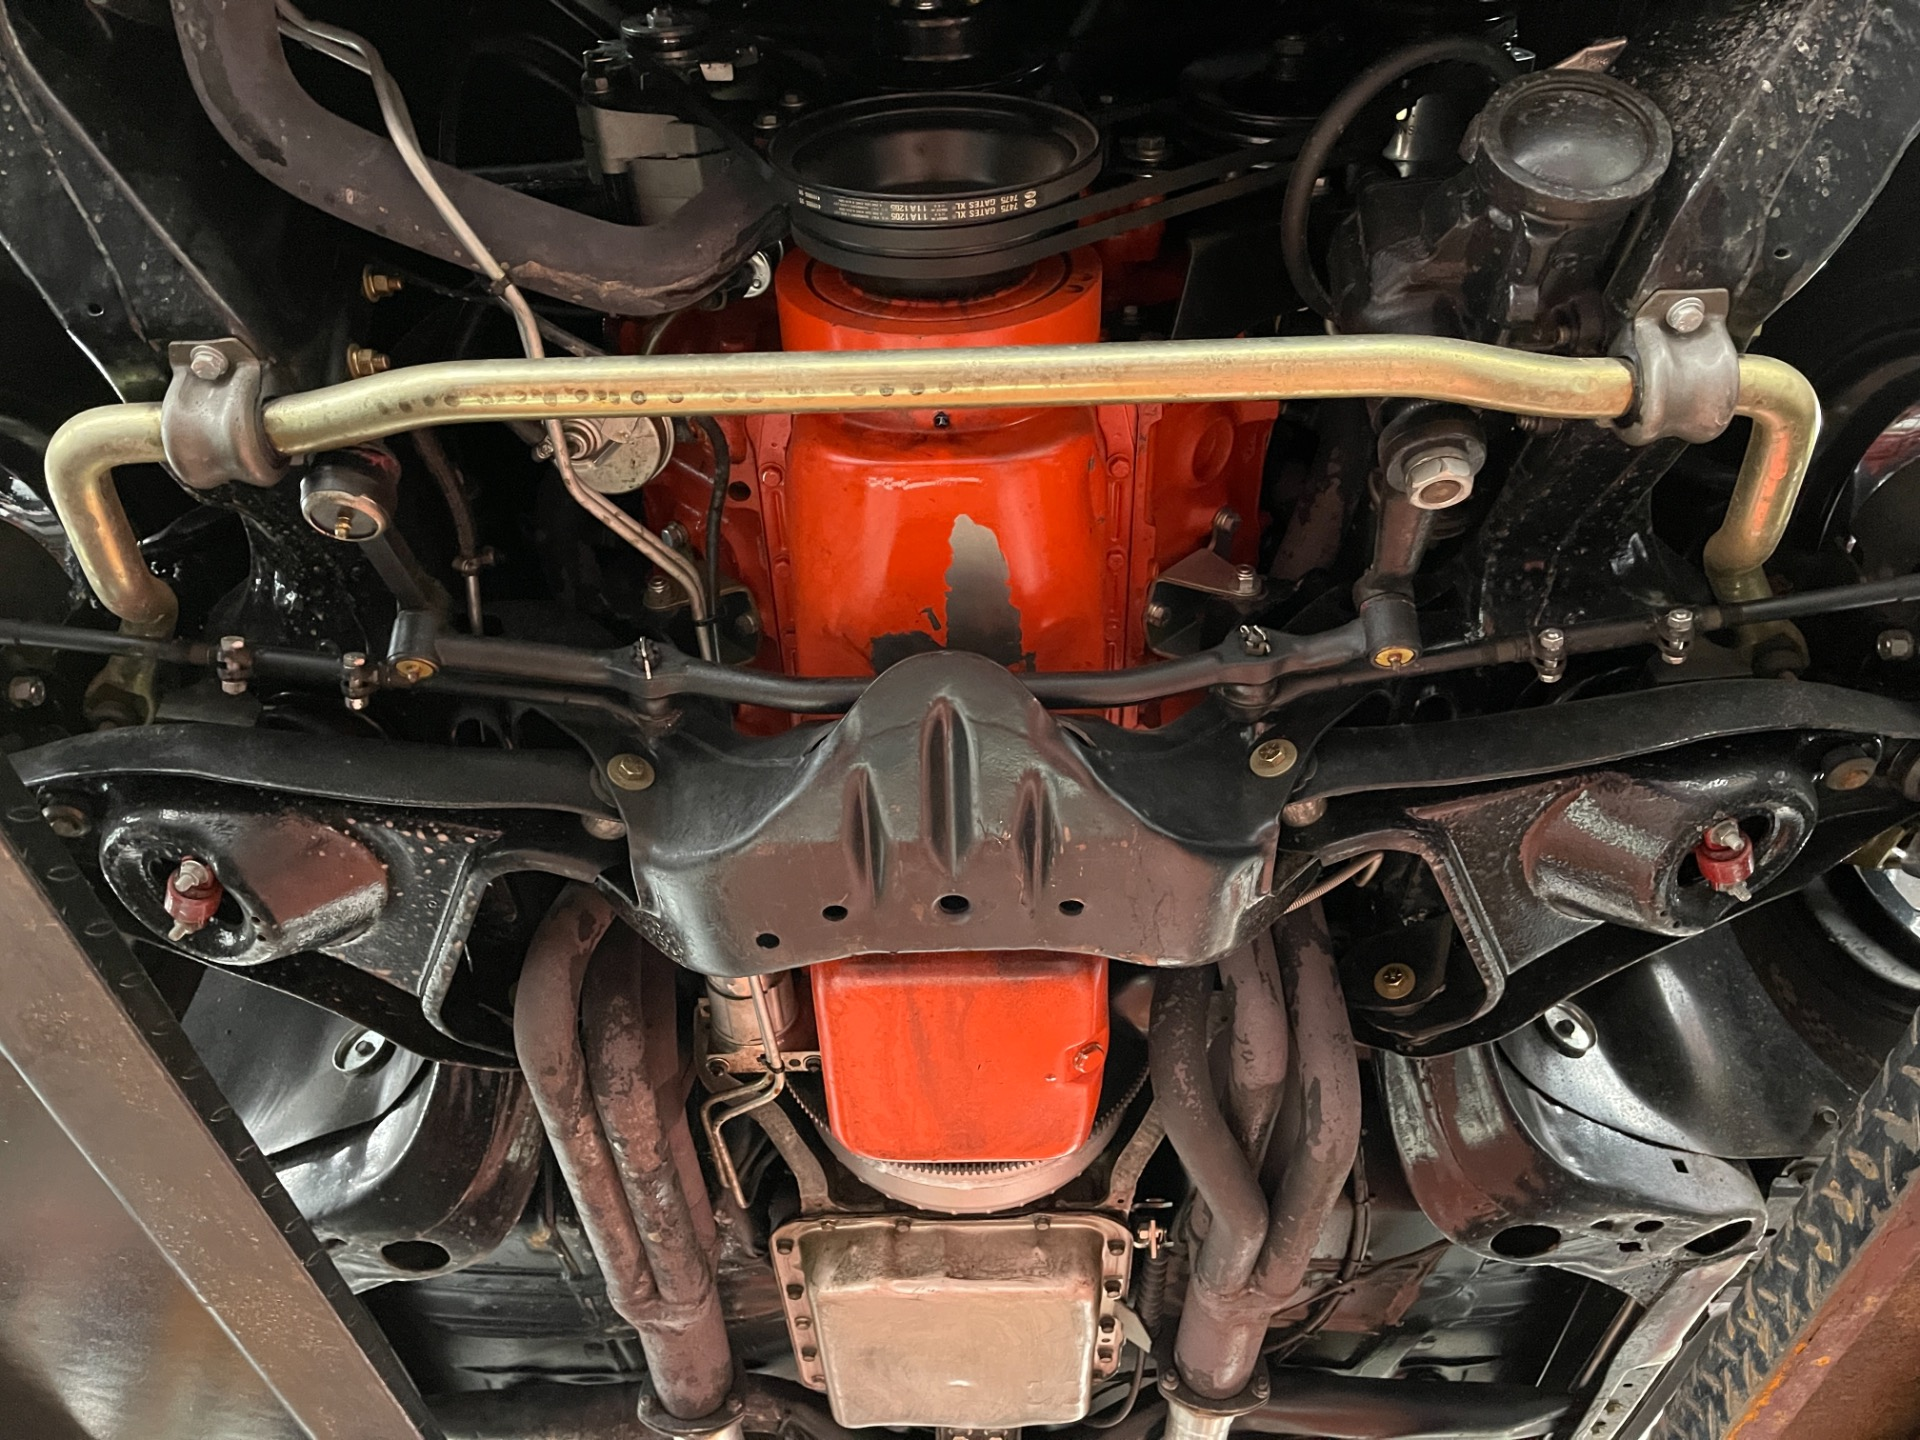 Used 1969 Chevrolet Chevelle - FRAME OFF RESTO MOD - 454 ENGINE - VINTAGE AIR - SEE VIDEO - | Mundelein, IL